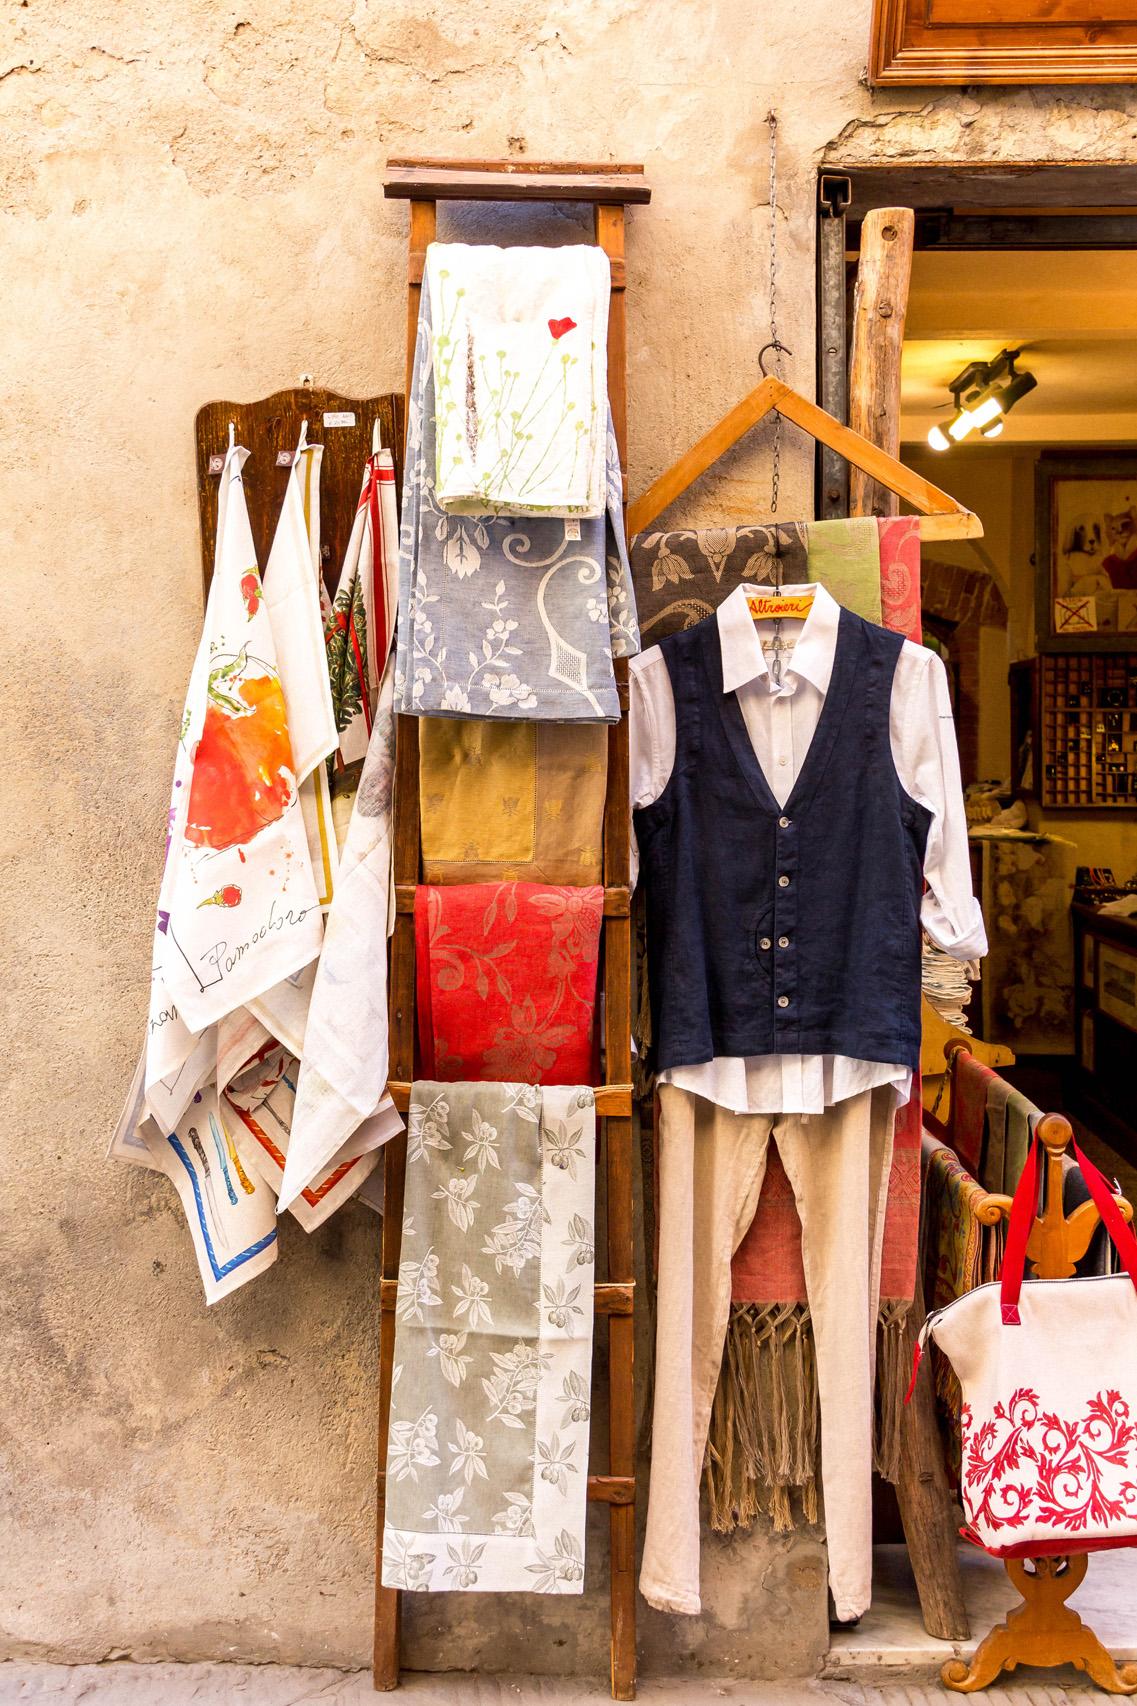 Linen shop in Pienza, Tuscany